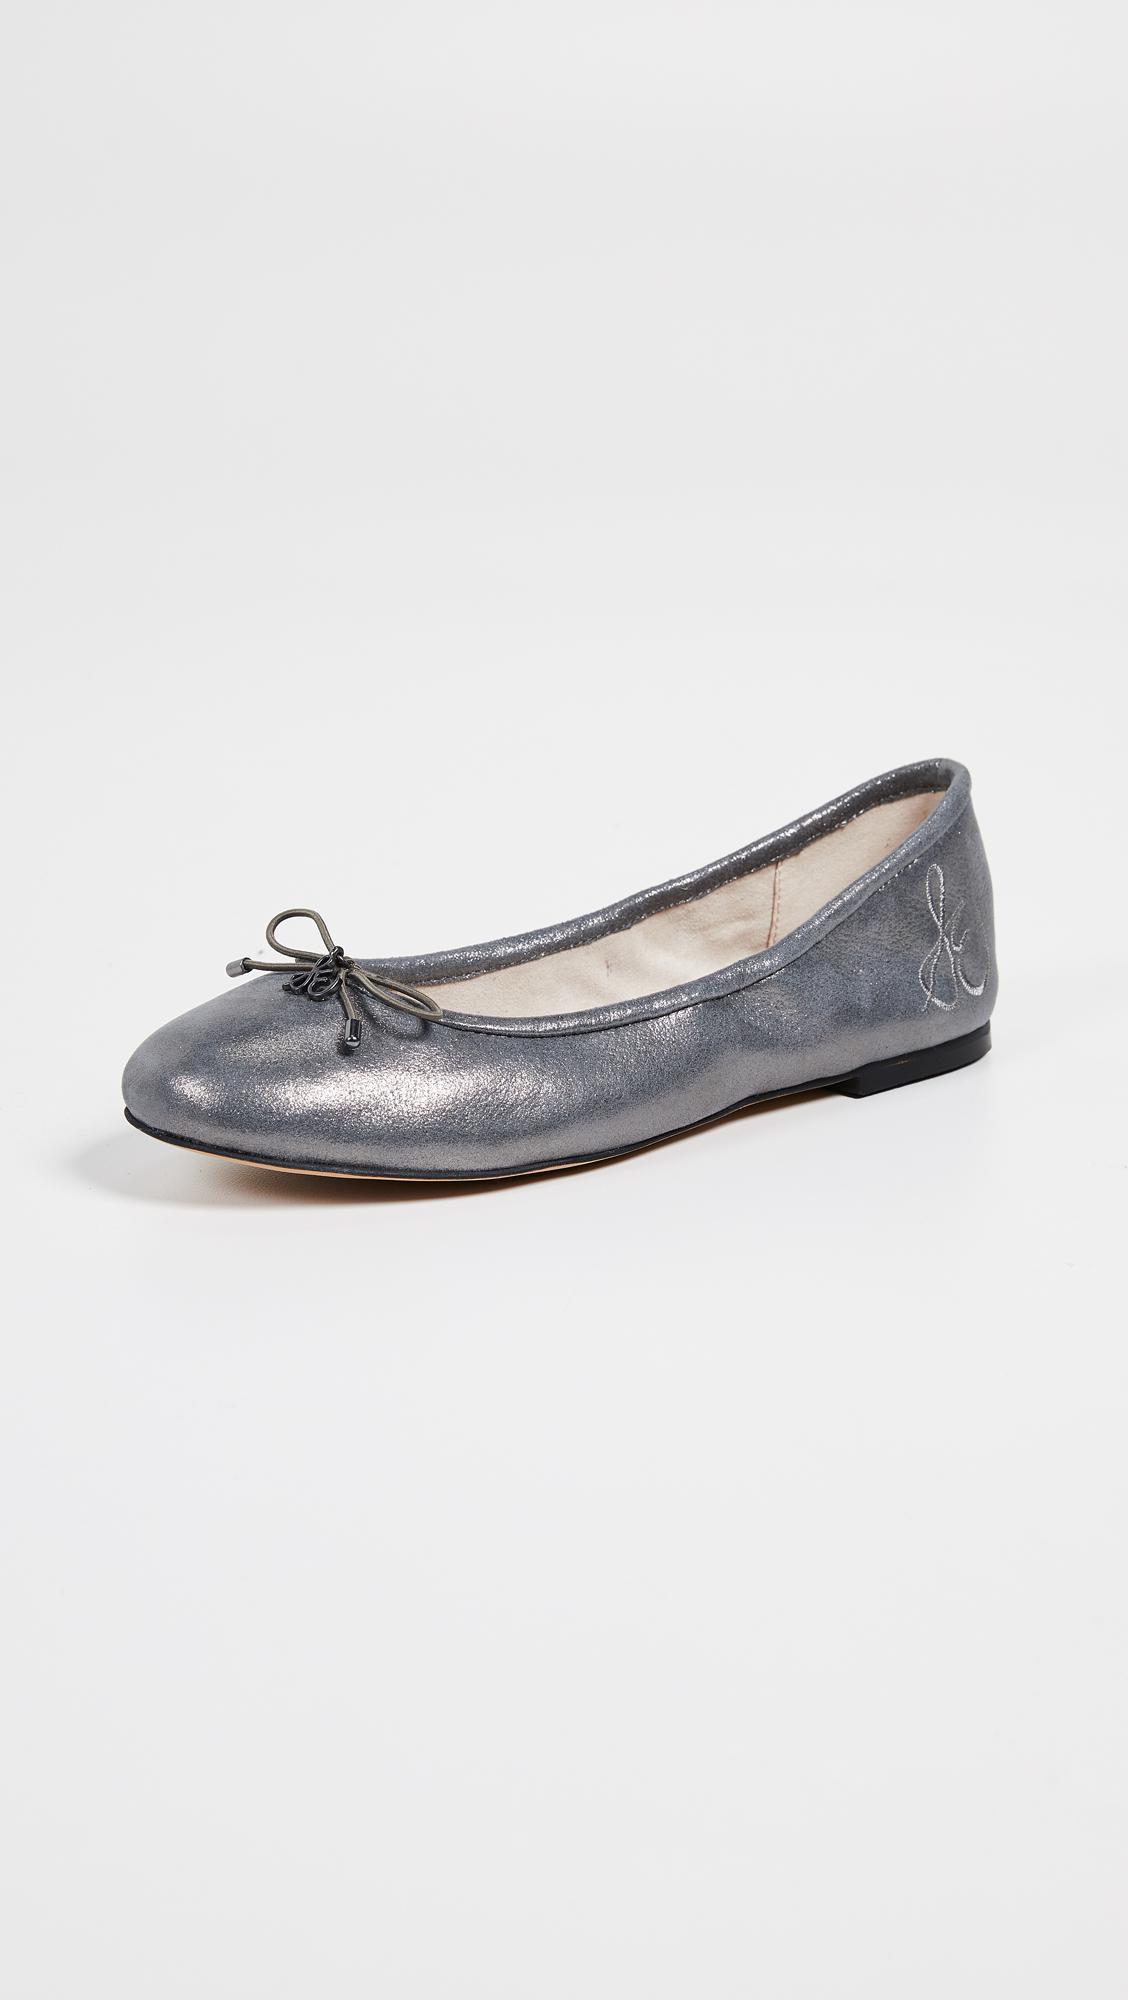 7b960ab19b8b Sam Edelman. Women s Felicia Flats